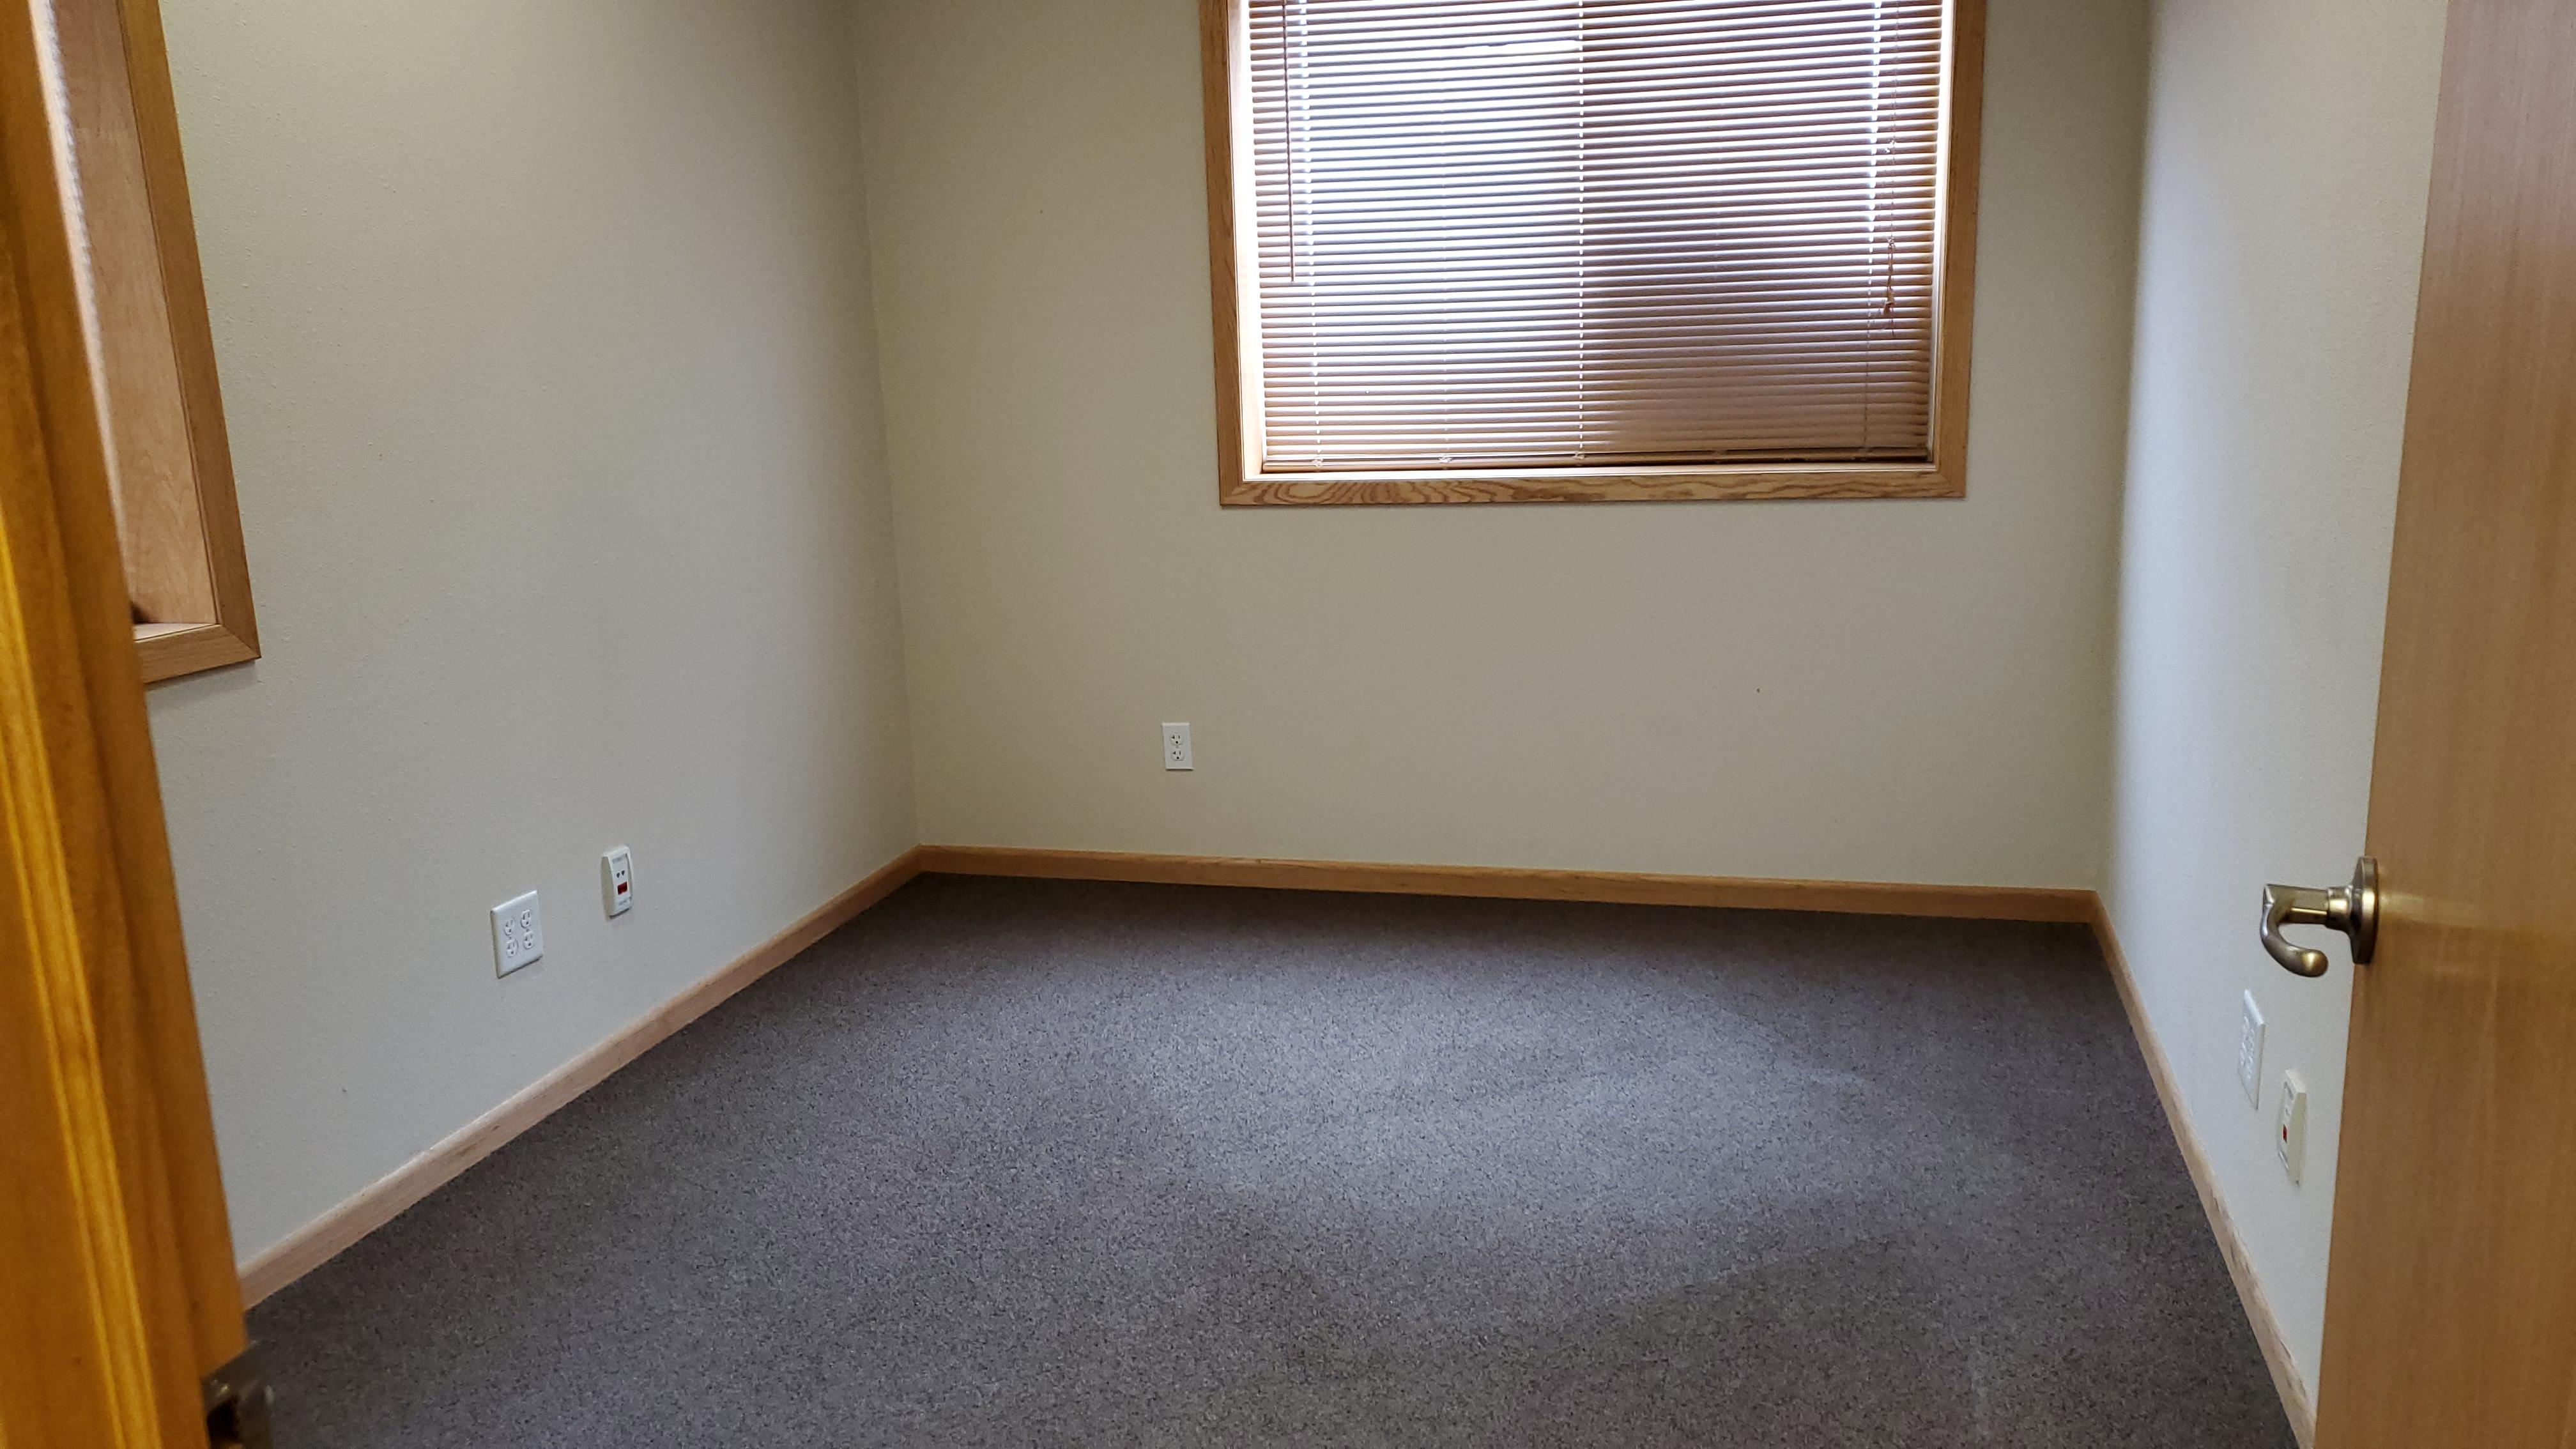 8x10' Office for Rent - 1st Floor